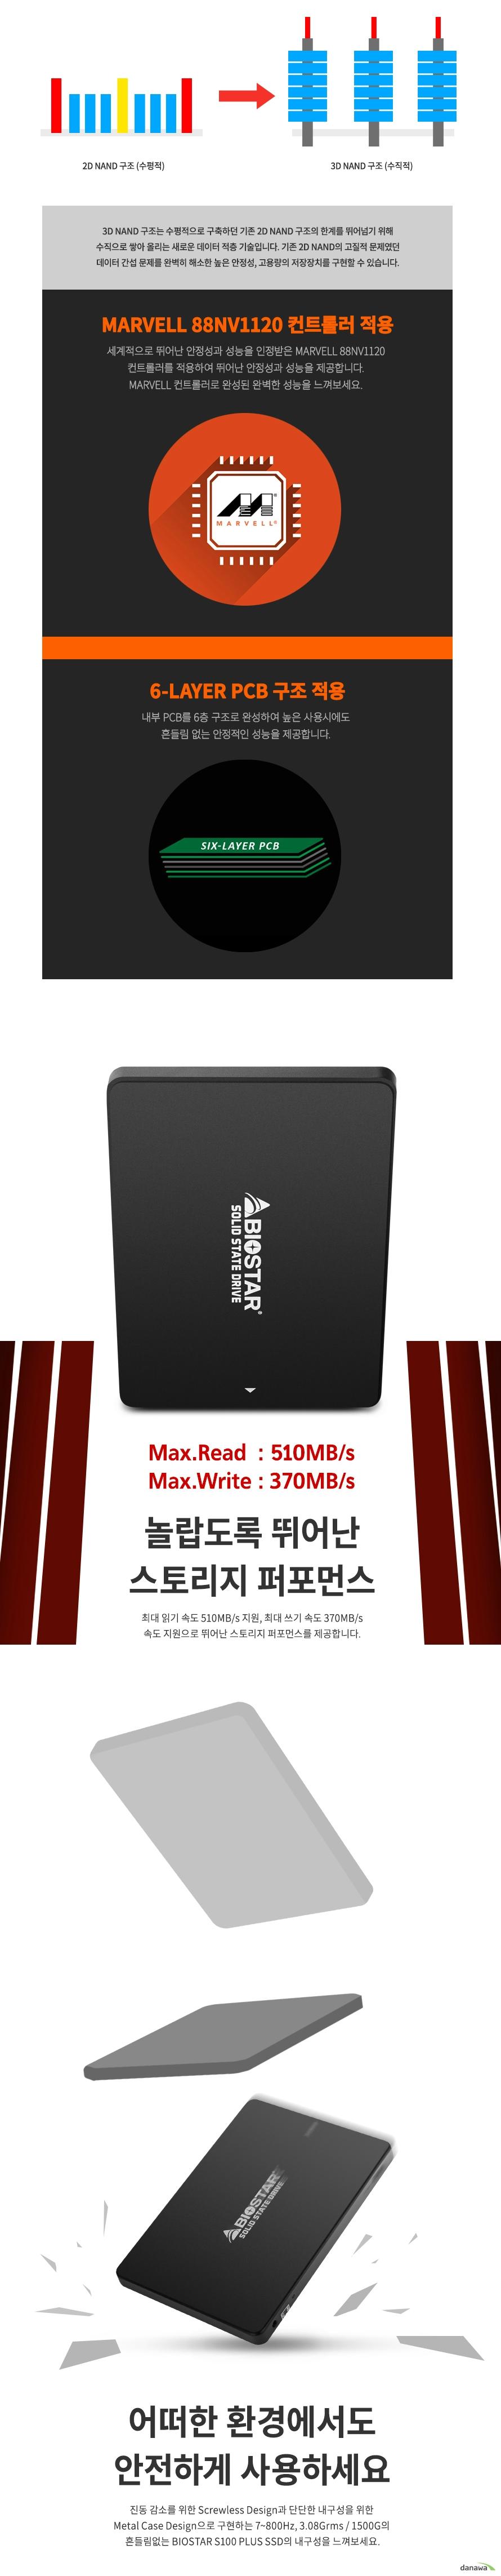 BIOSTAR  S100 PLUS(240GB)